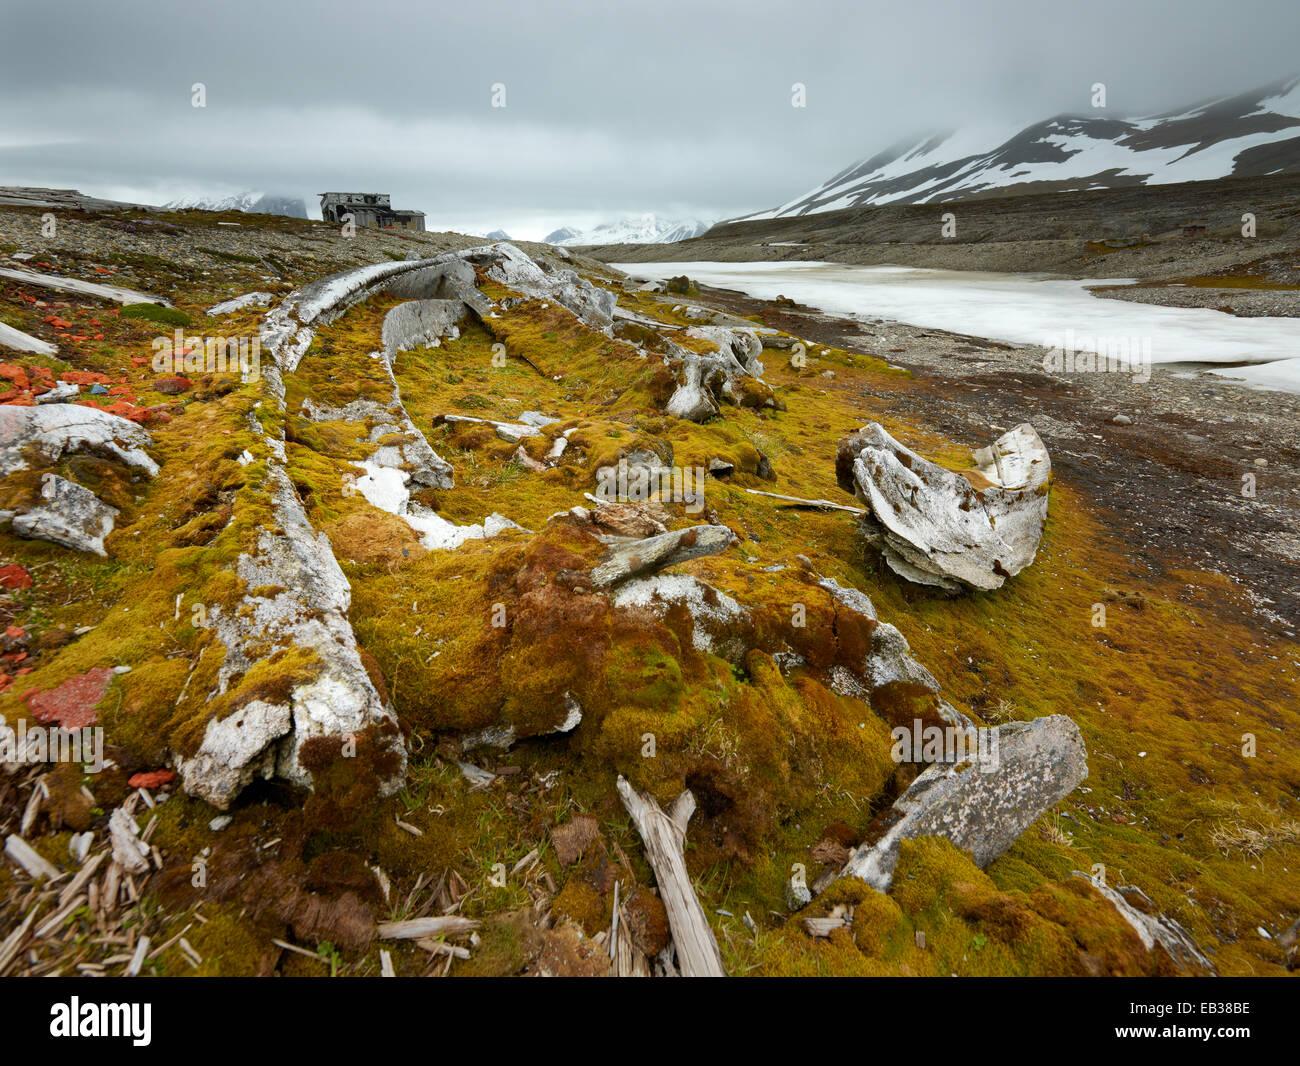 Old whale bones, overgrown with moss, Spitsbergen Island, Svalbard Archipelago, Svalbard and Jan Mayen, Norway - Stock Image